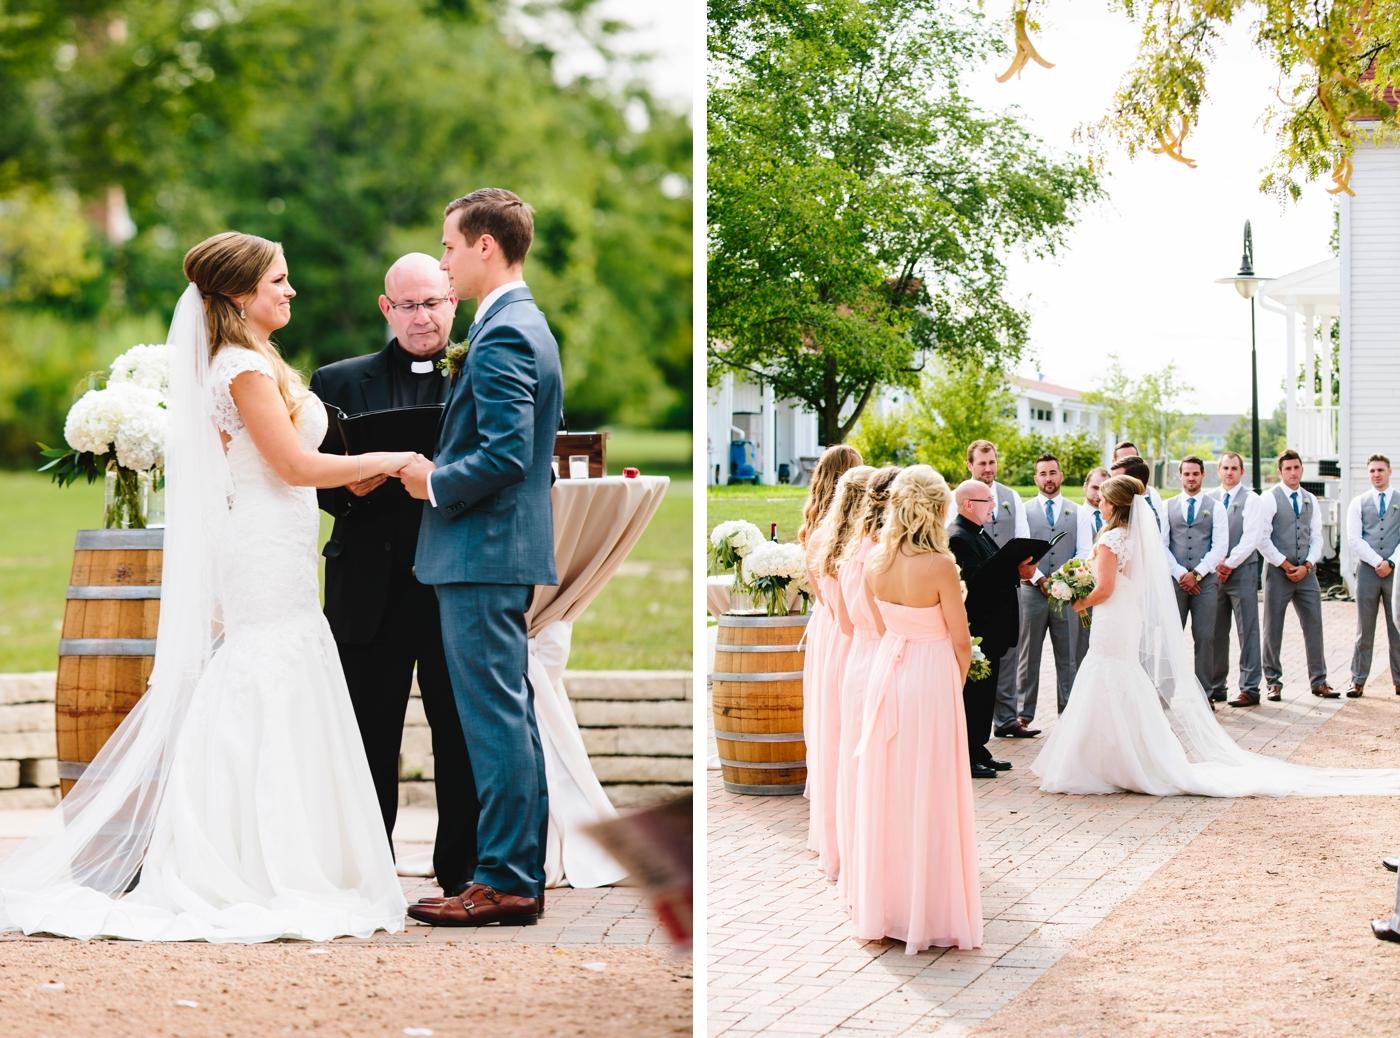 chicago-fine-art-wedding-photography-chiapetta25